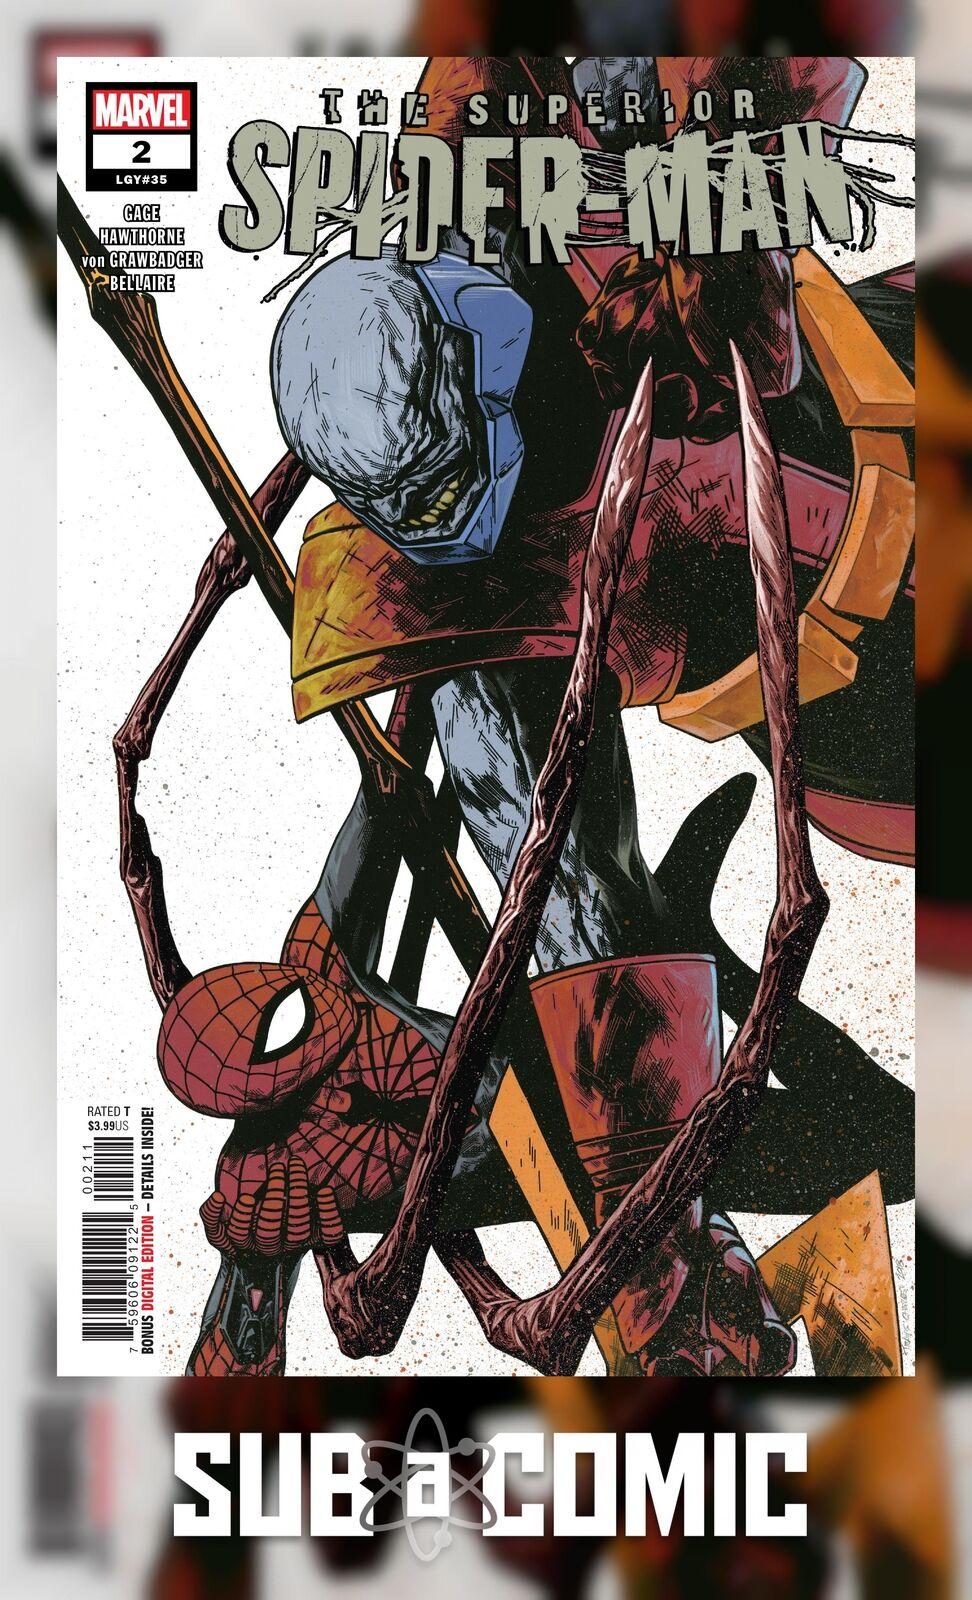 TRAVIS CHAREST MAIN COVER MARVEL COMICS//2019 SUPERIOR SPIDER-MAN #4